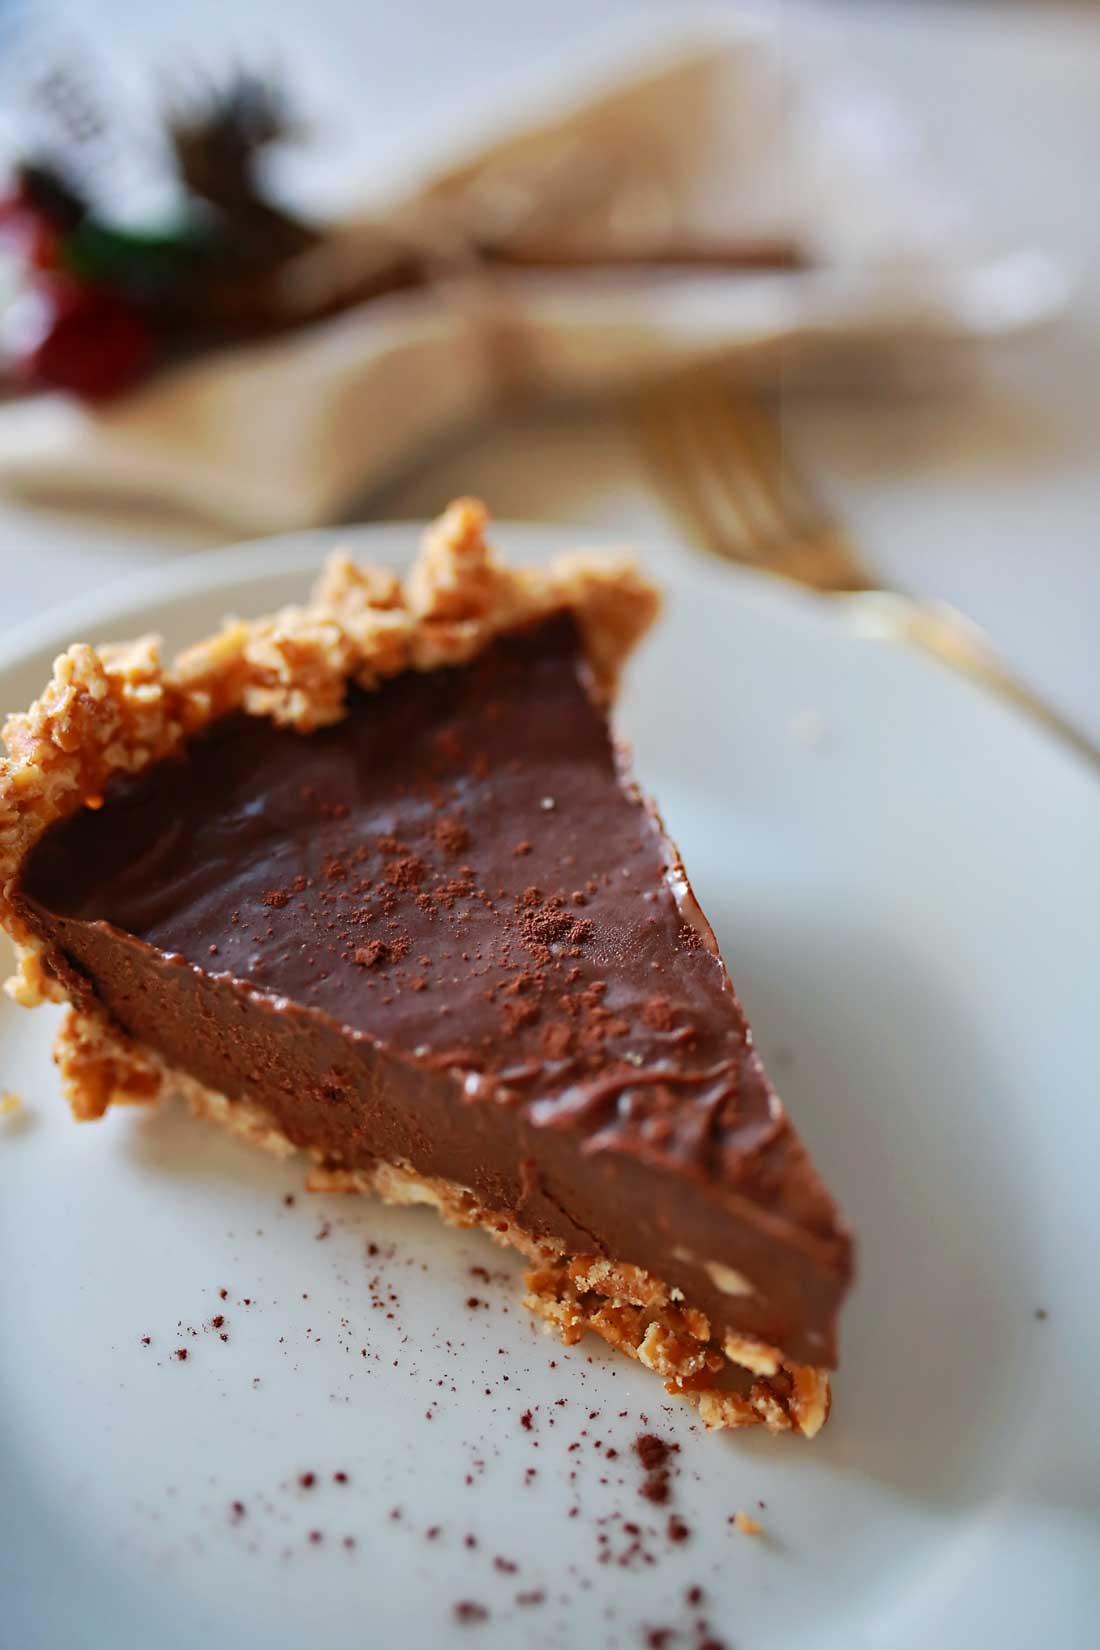 Oh my gosh YUMMY!!! Chocolate truffle silk pie with a crunchy pretzel crust!